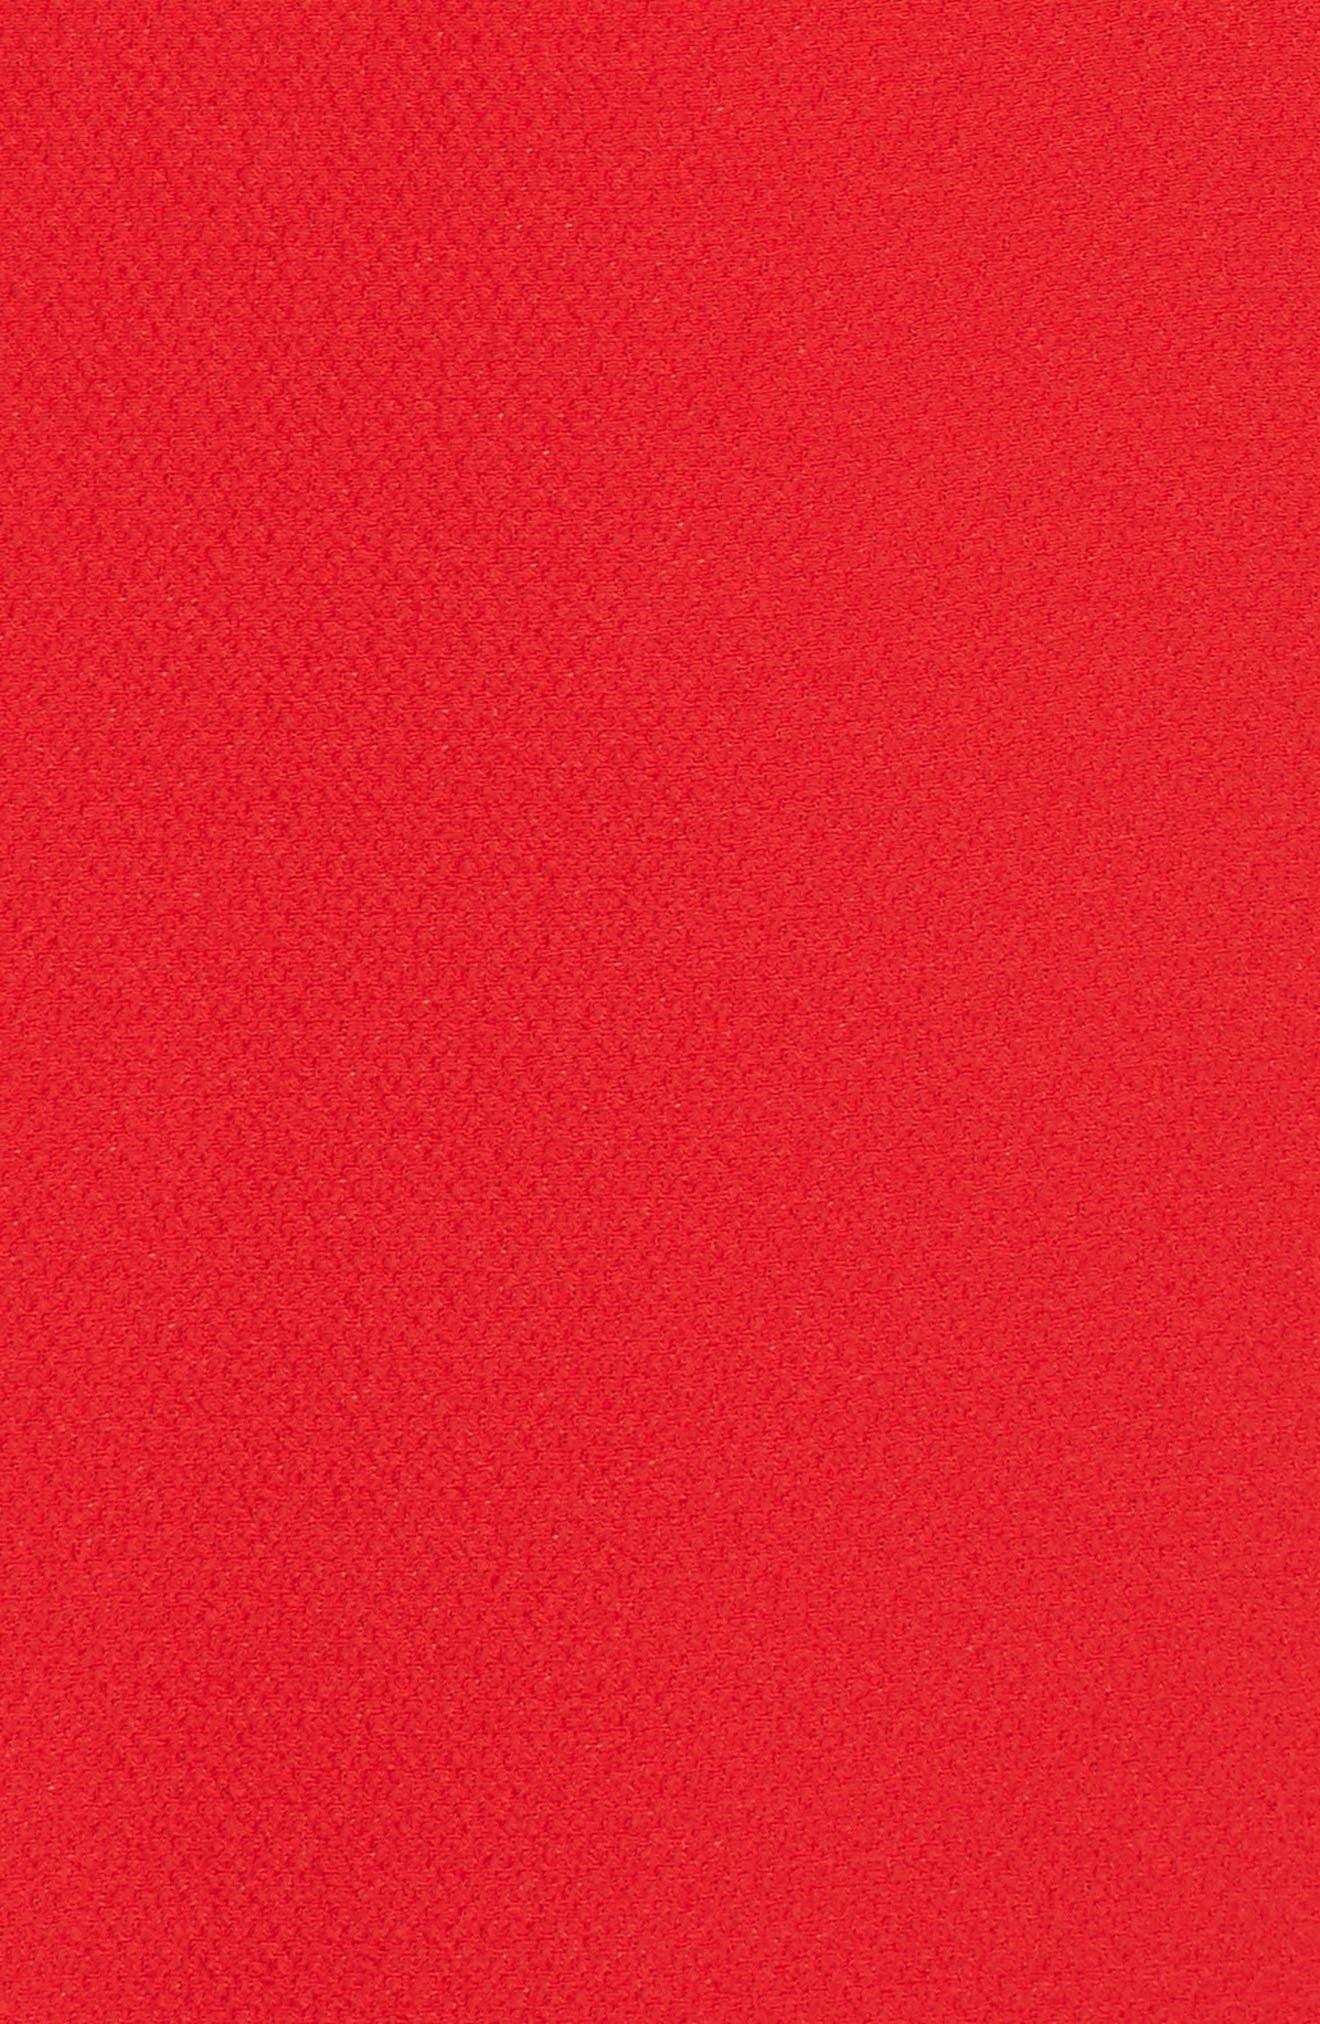 Carrara Slit Maxi Dress,                             Alternate thumbnail 10, color,